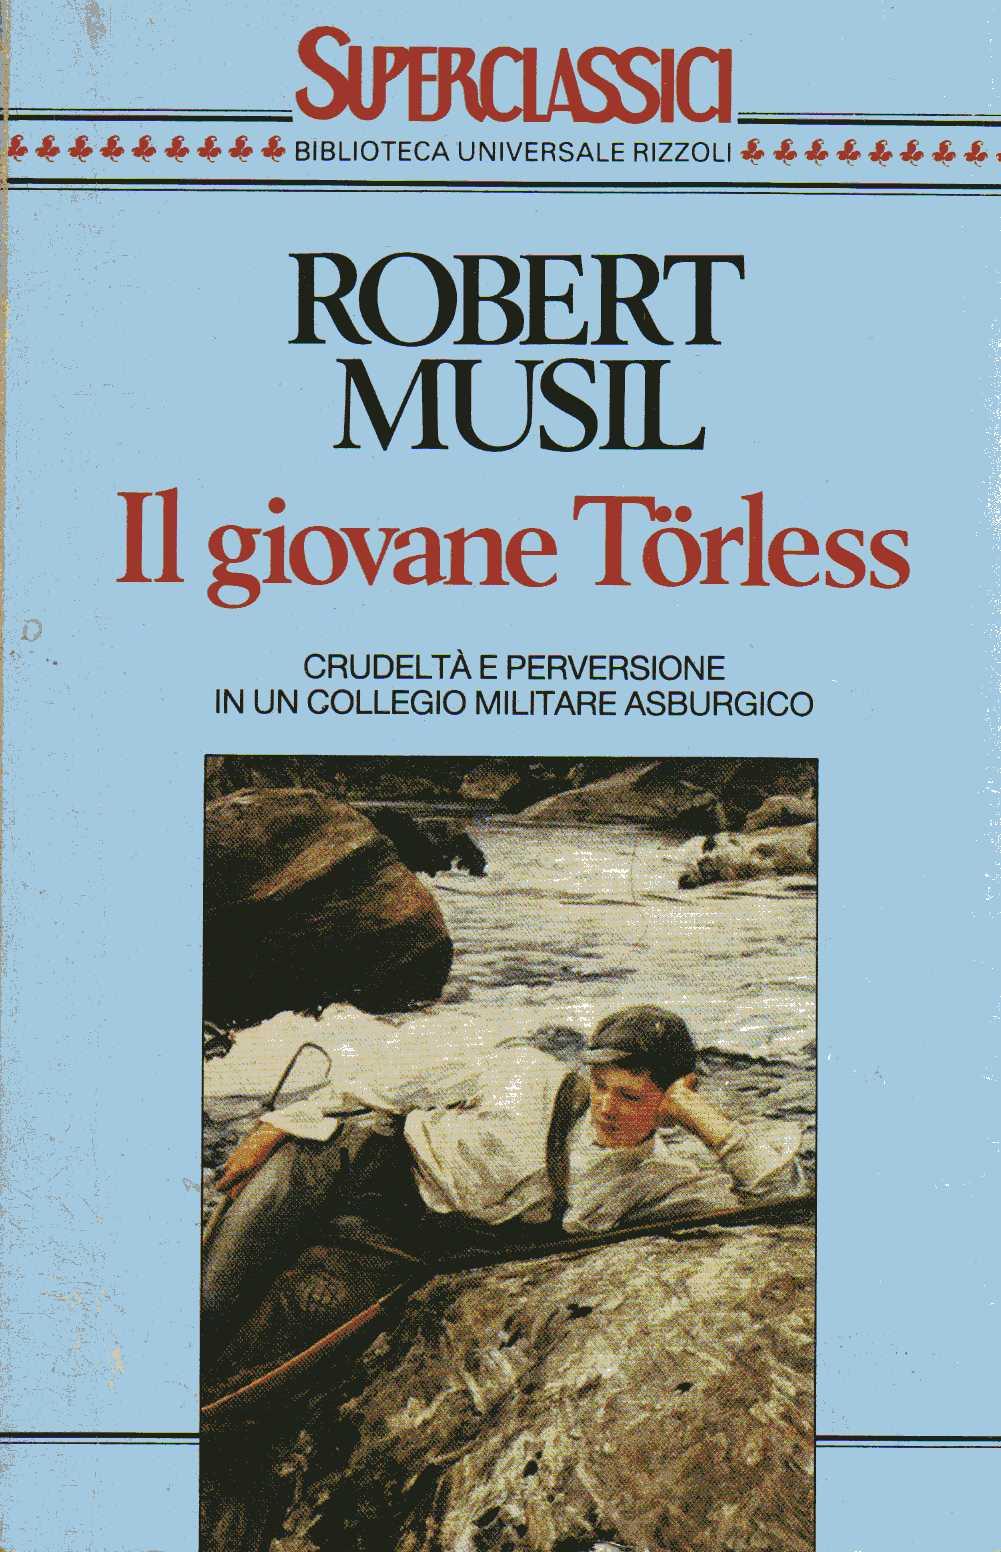 Il giovane Törless